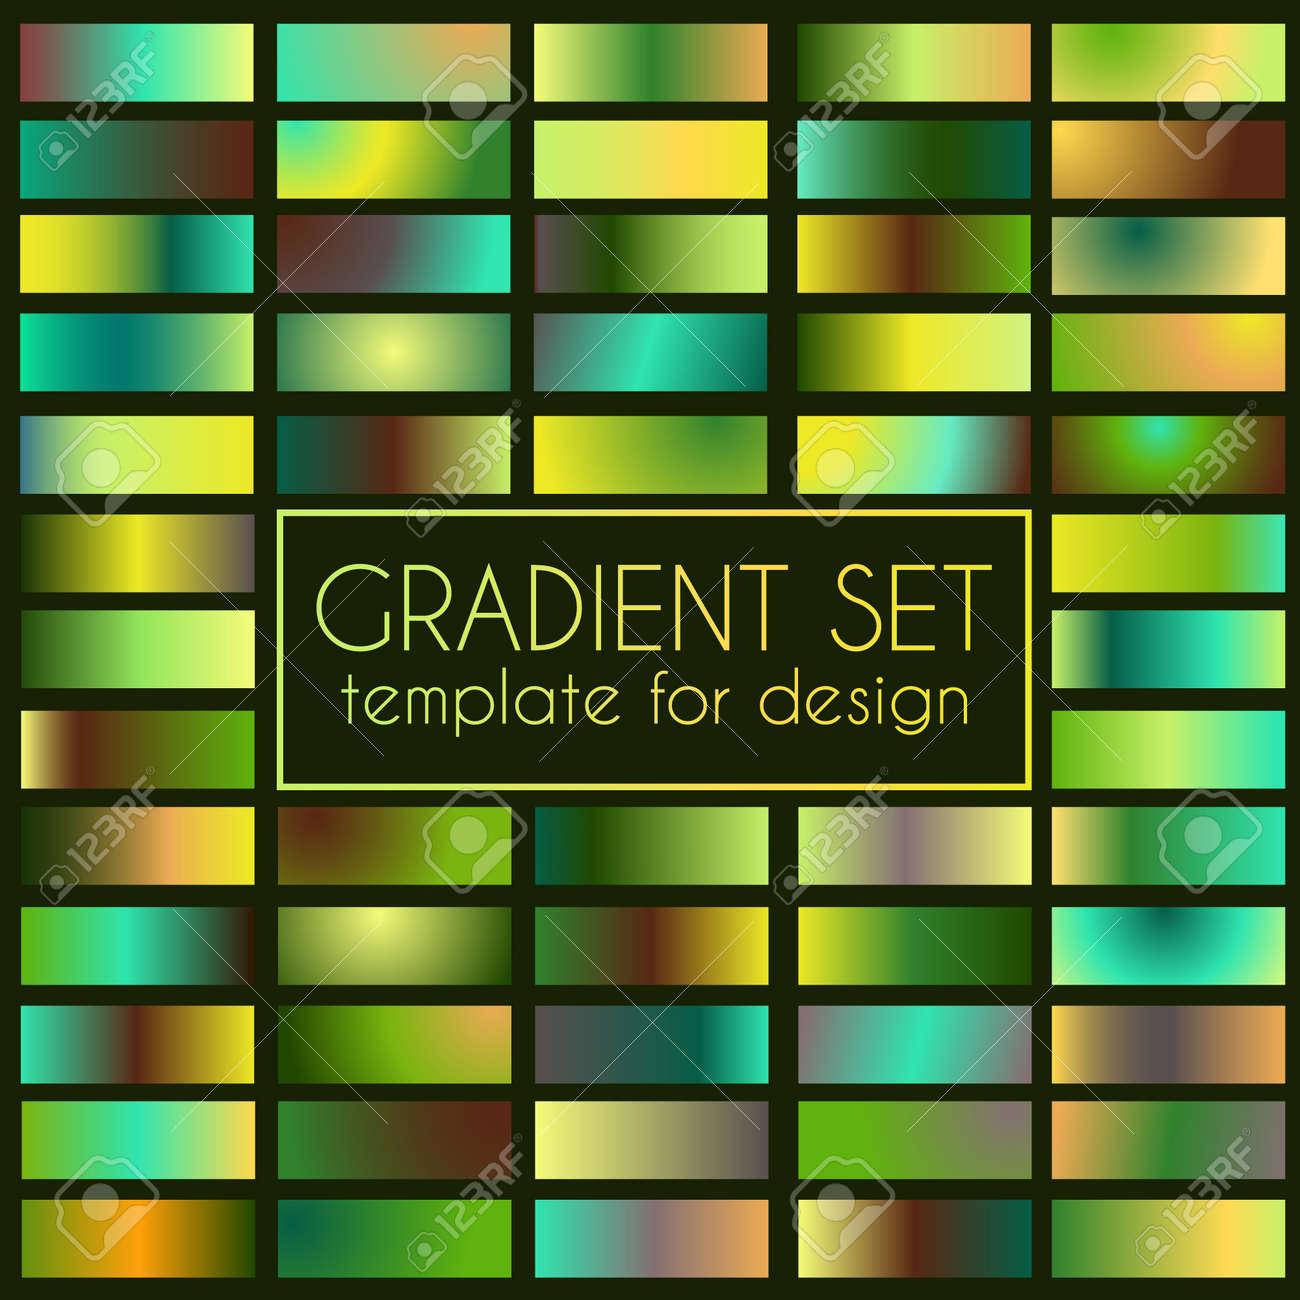 Multicolored bright gradient set. Template for design - 114806853